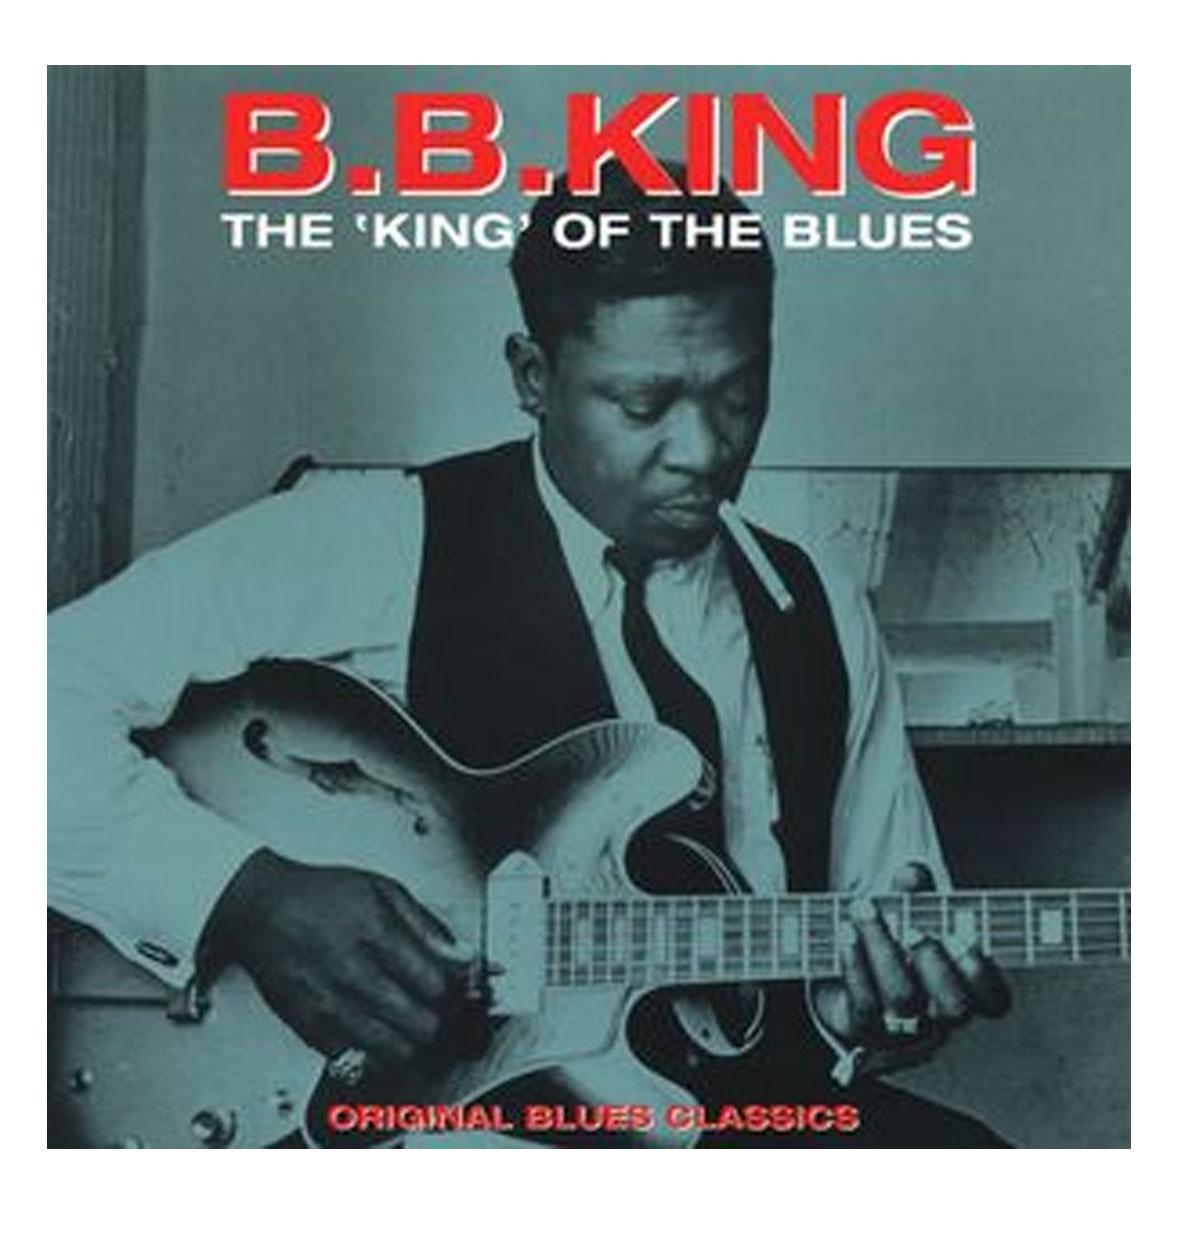 B.B. King - The 'King' Of The Blues LP